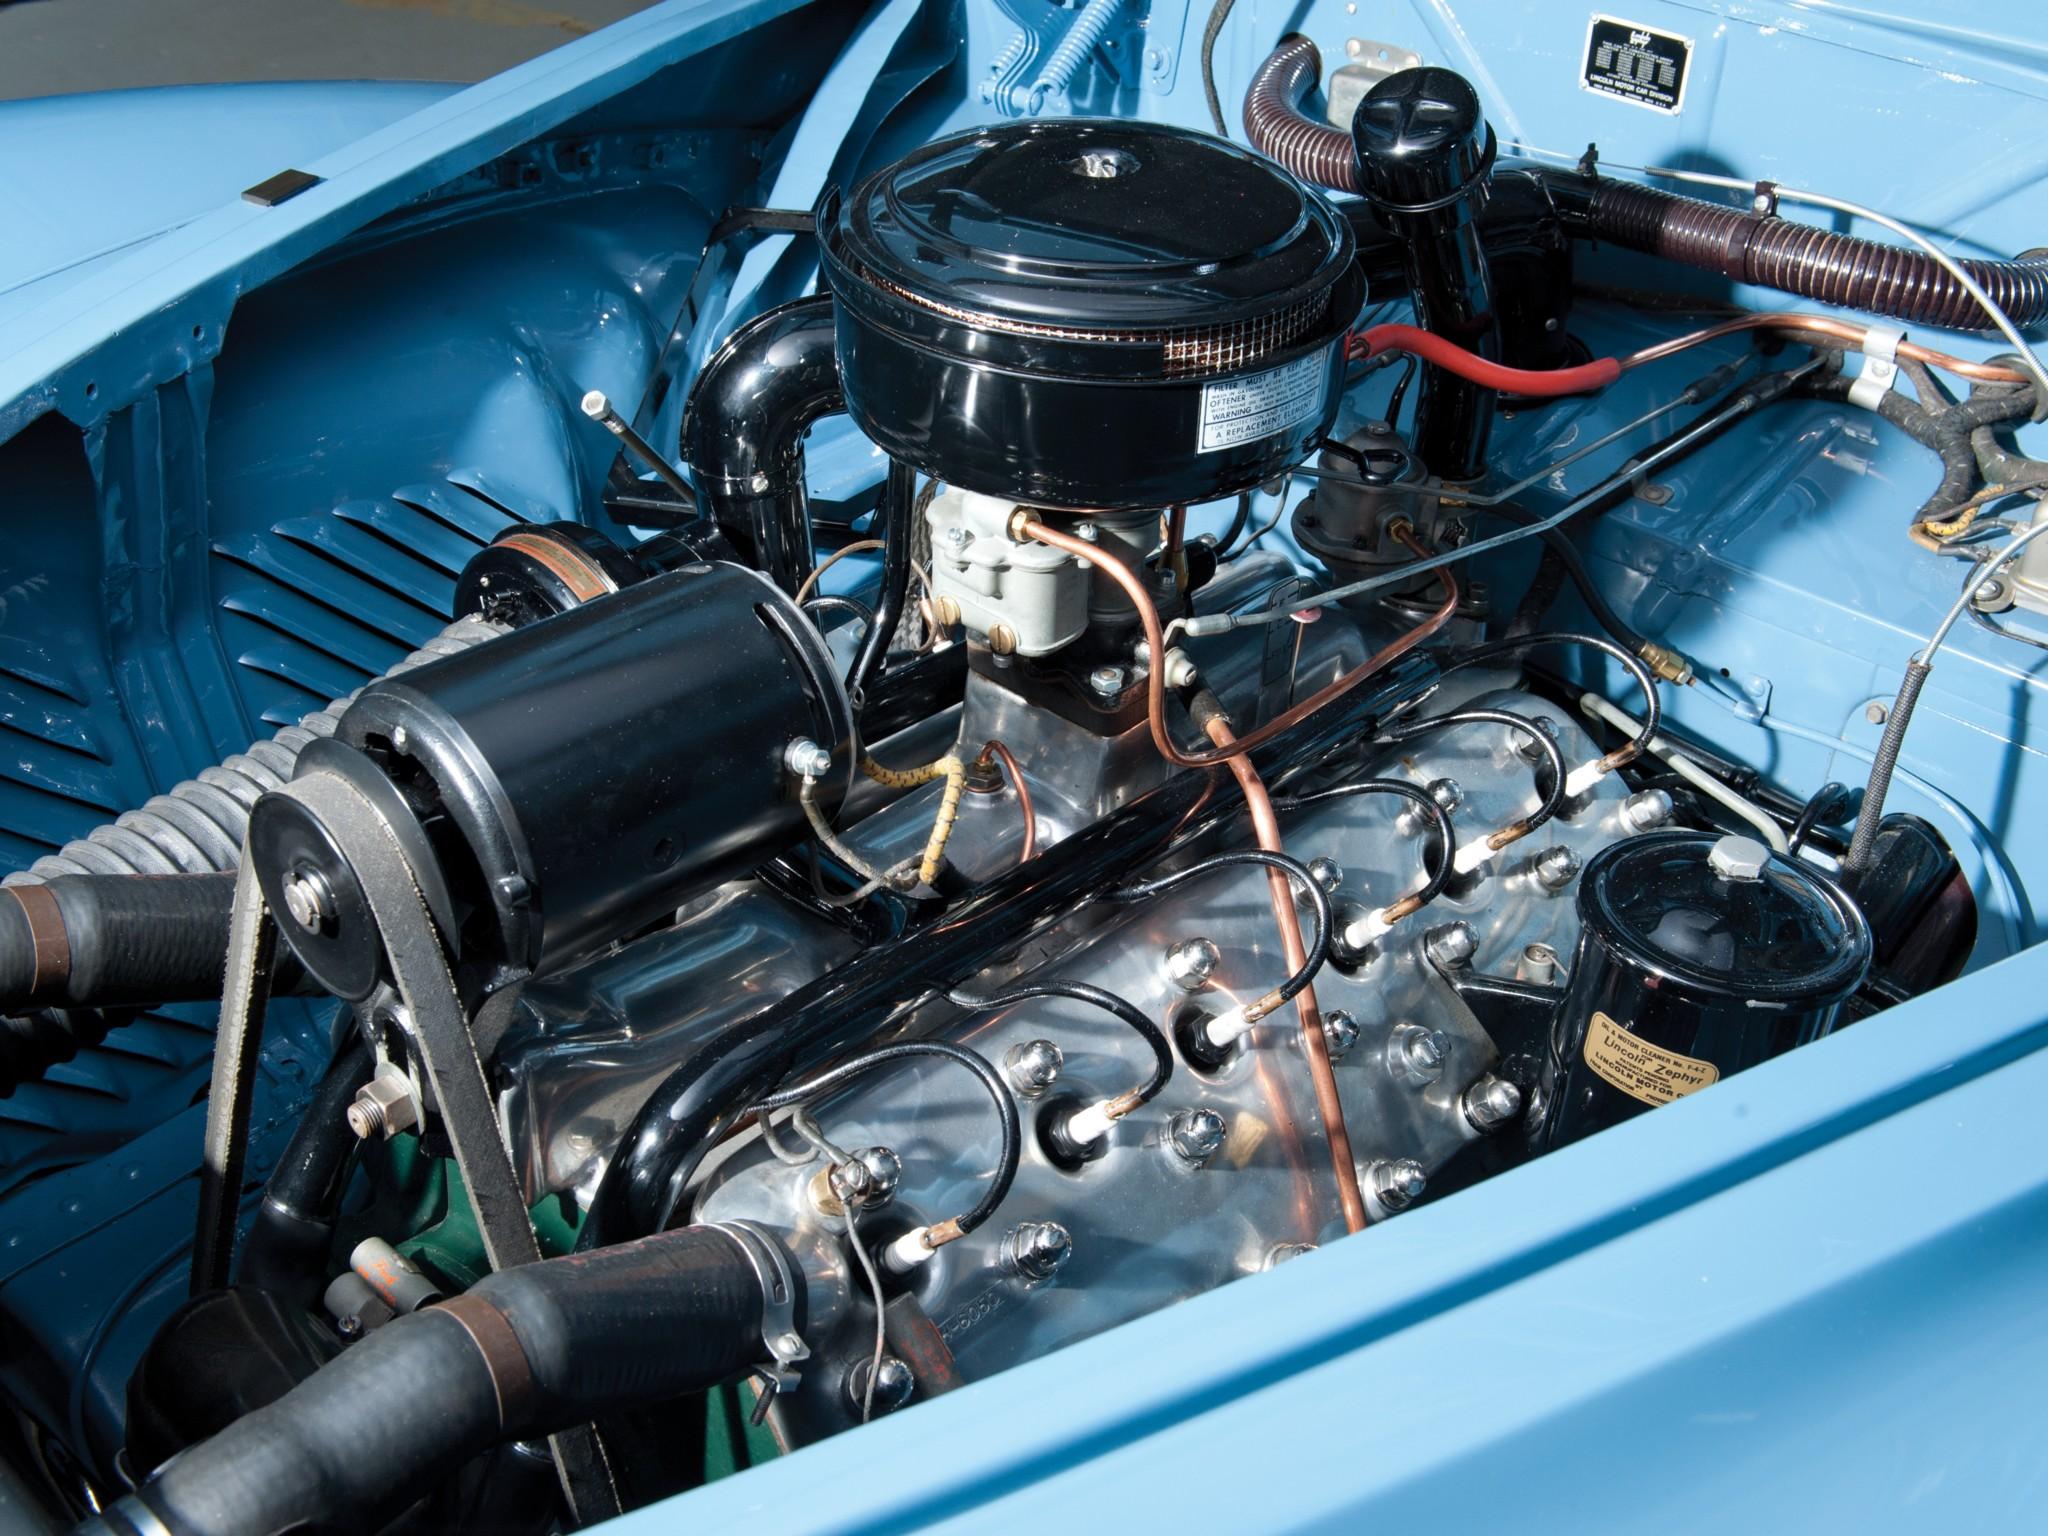 1940 Lincoln Zephyr Continental Cabriolet Retro Luxury Engine G Wallpaper